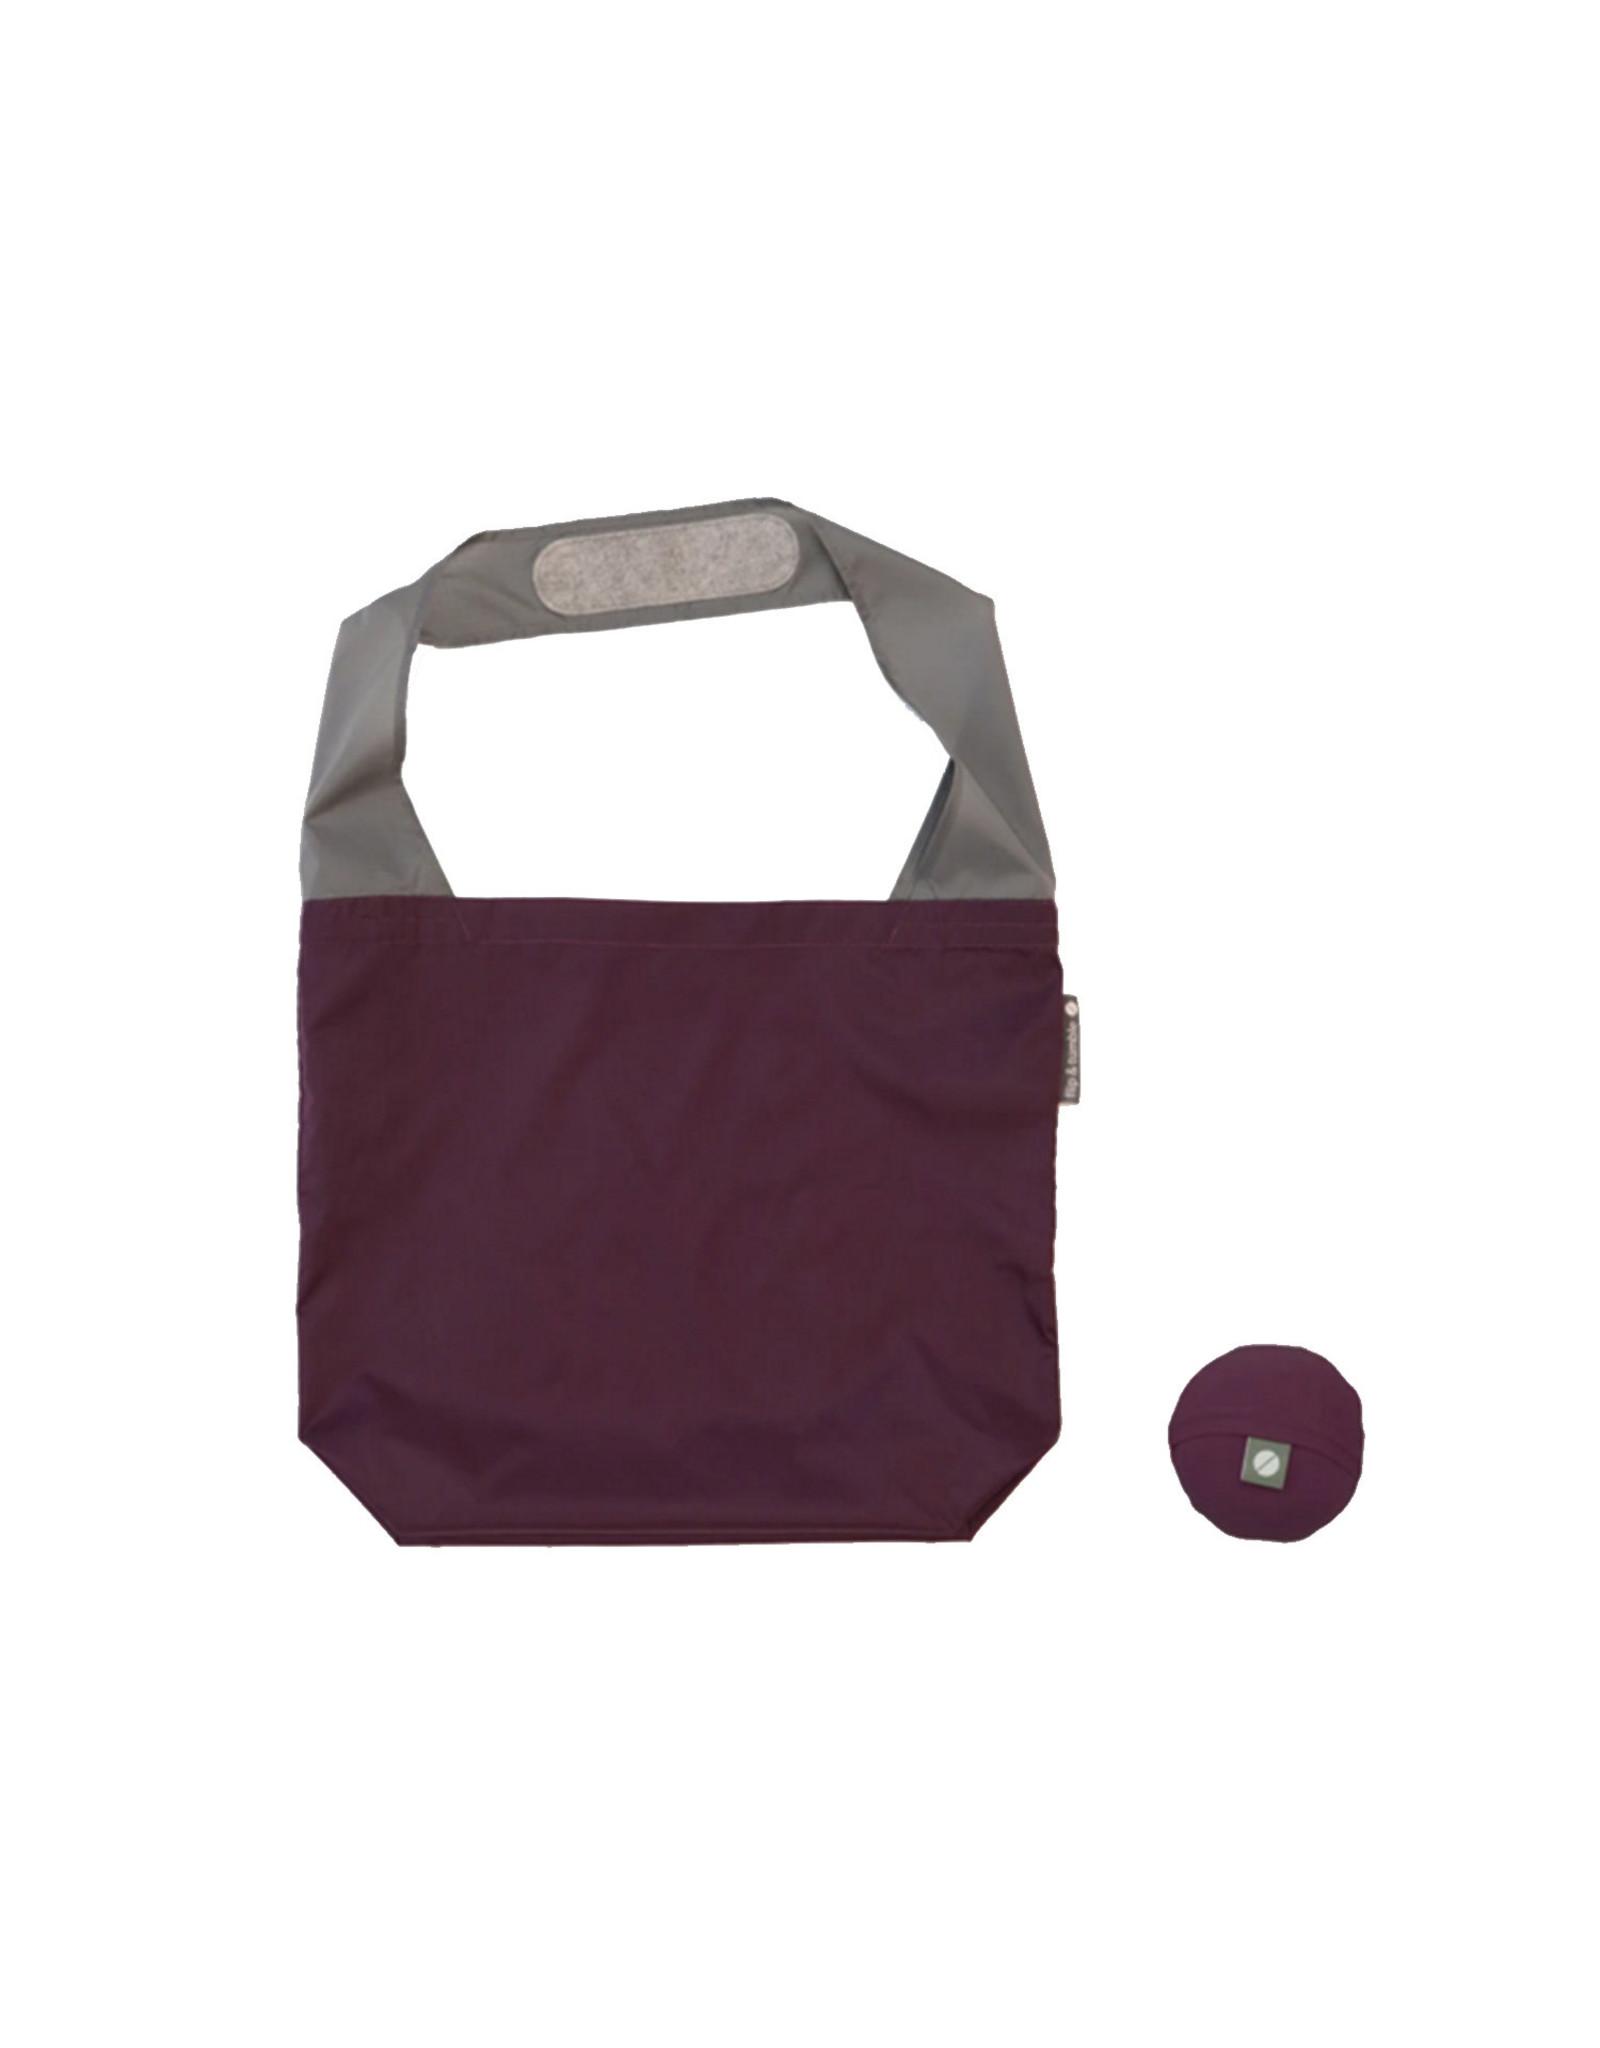 Flip & Tumble 24/7 Bag, Eggplant